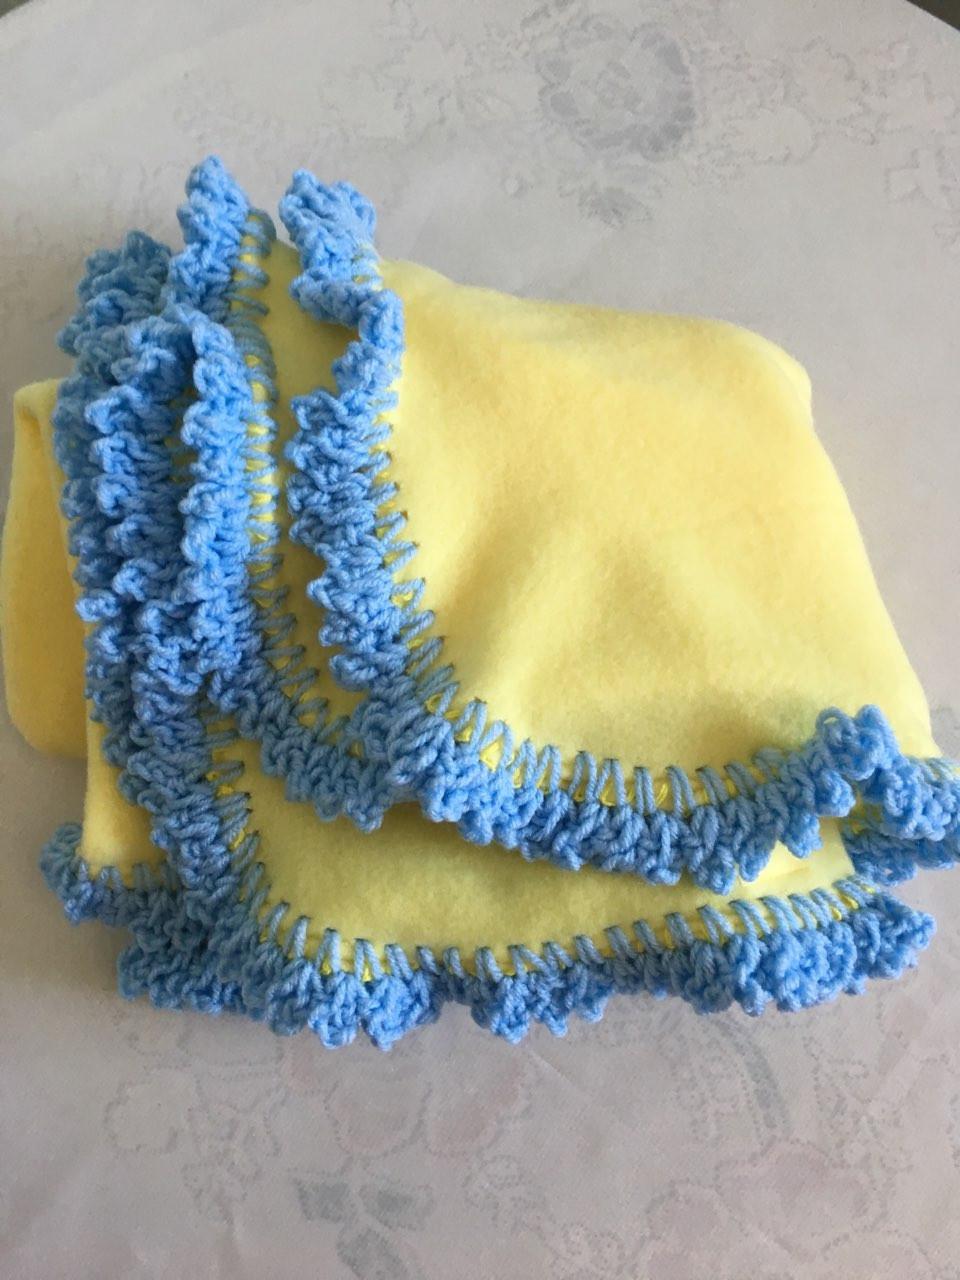 Blue Icing Polar Fleece Baby Blanket French Design Hand Crocheted Border Light Blue Light Blue Free Shipping Shop1707llc